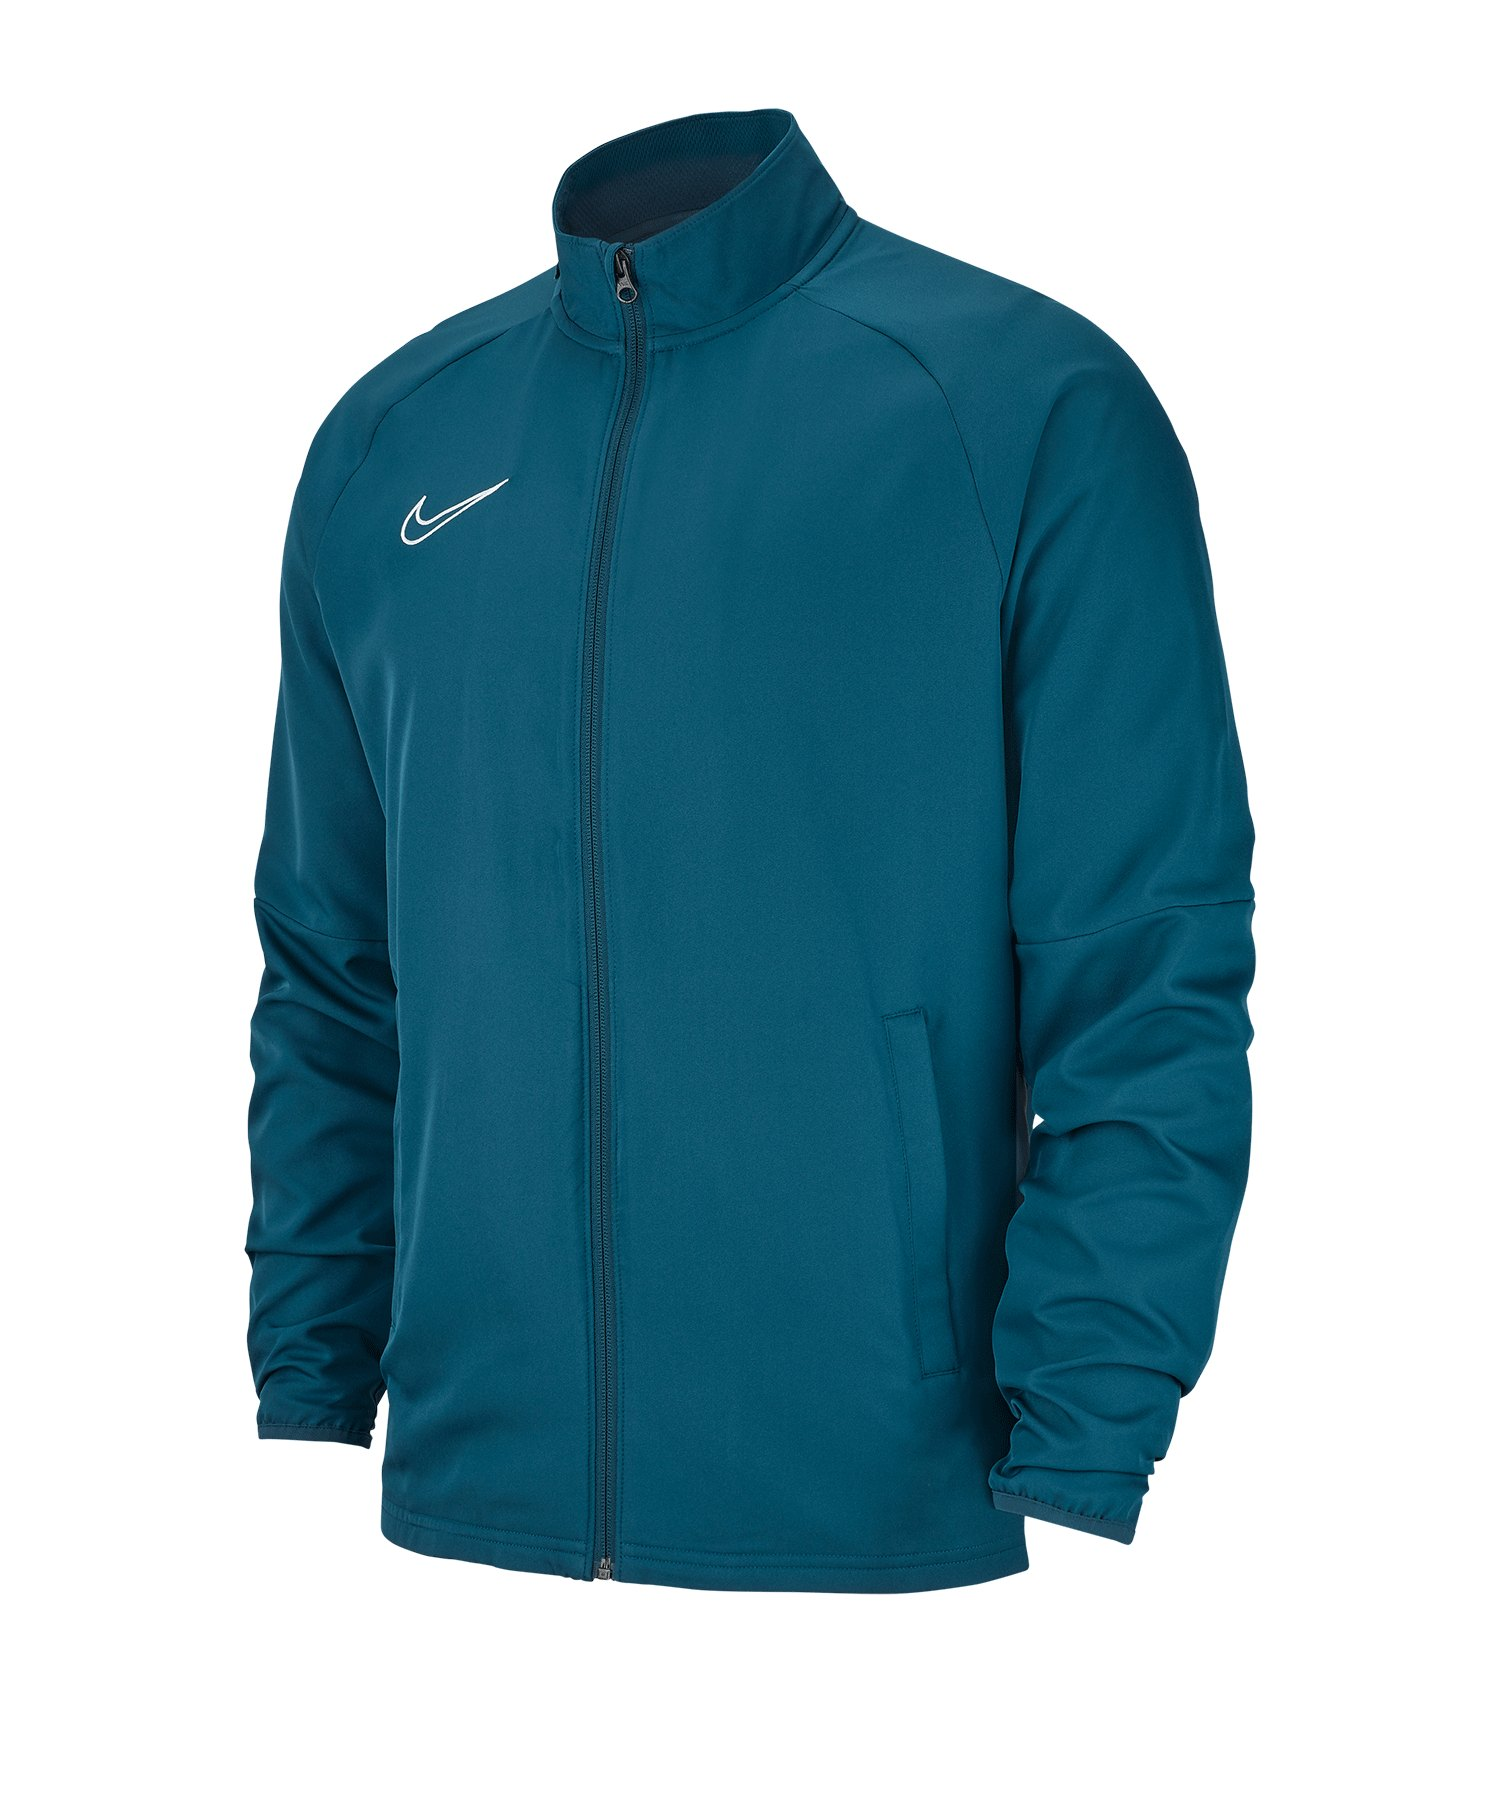 Nike Academy 19 Woven Präsentationsjacke Blau F404 - blau